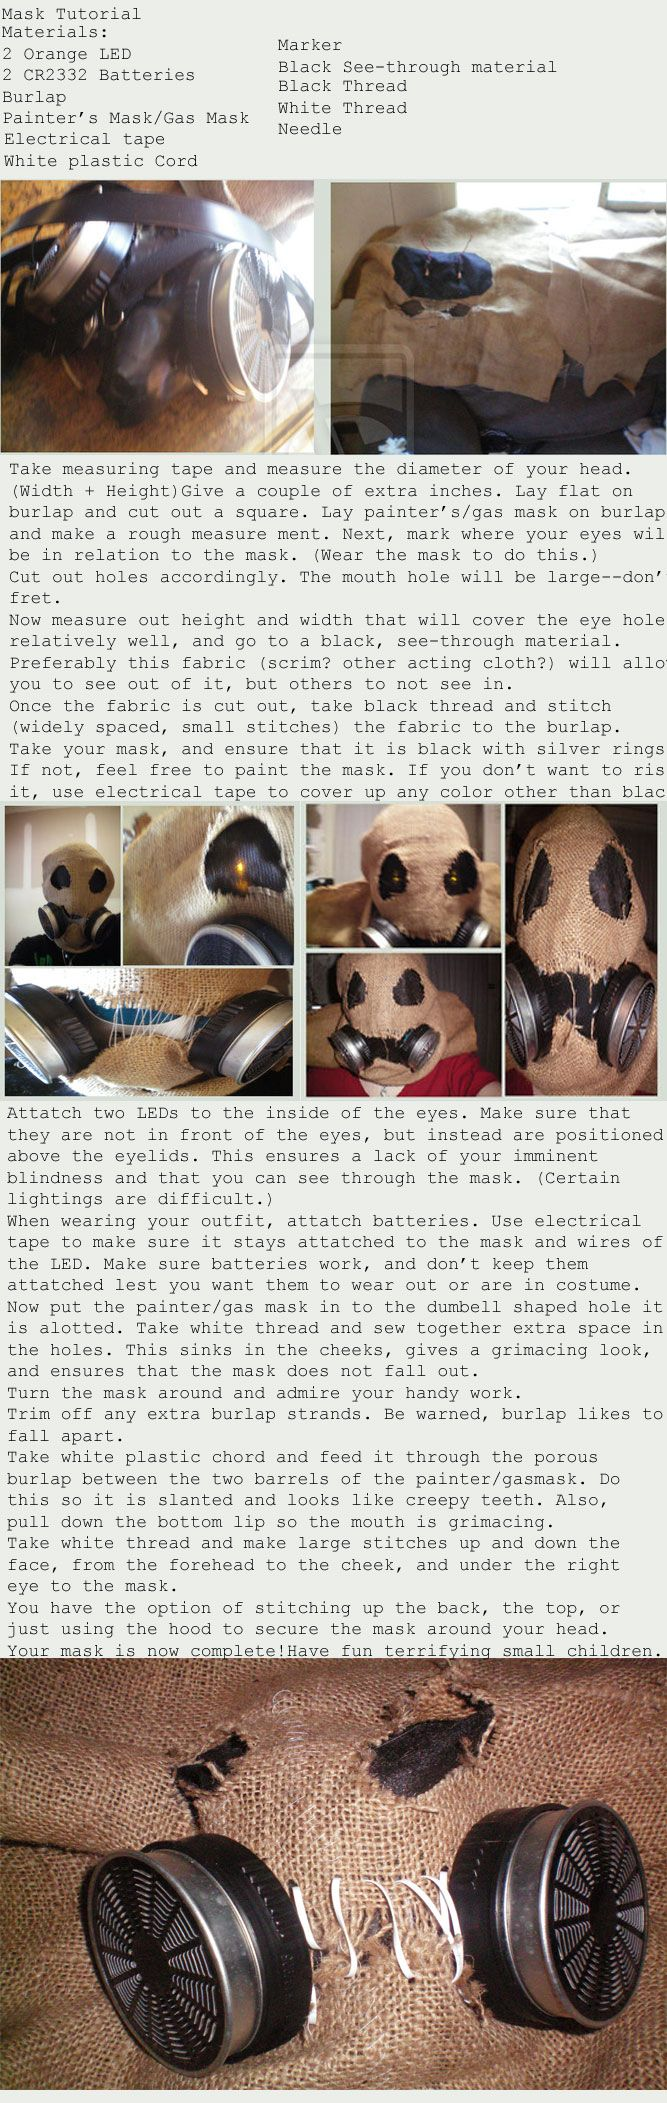 Scarecrow mask tutorial - http://defenestrate-felt.deviantart.com/art/Scarecrow-Mask-Tutorial-162749334